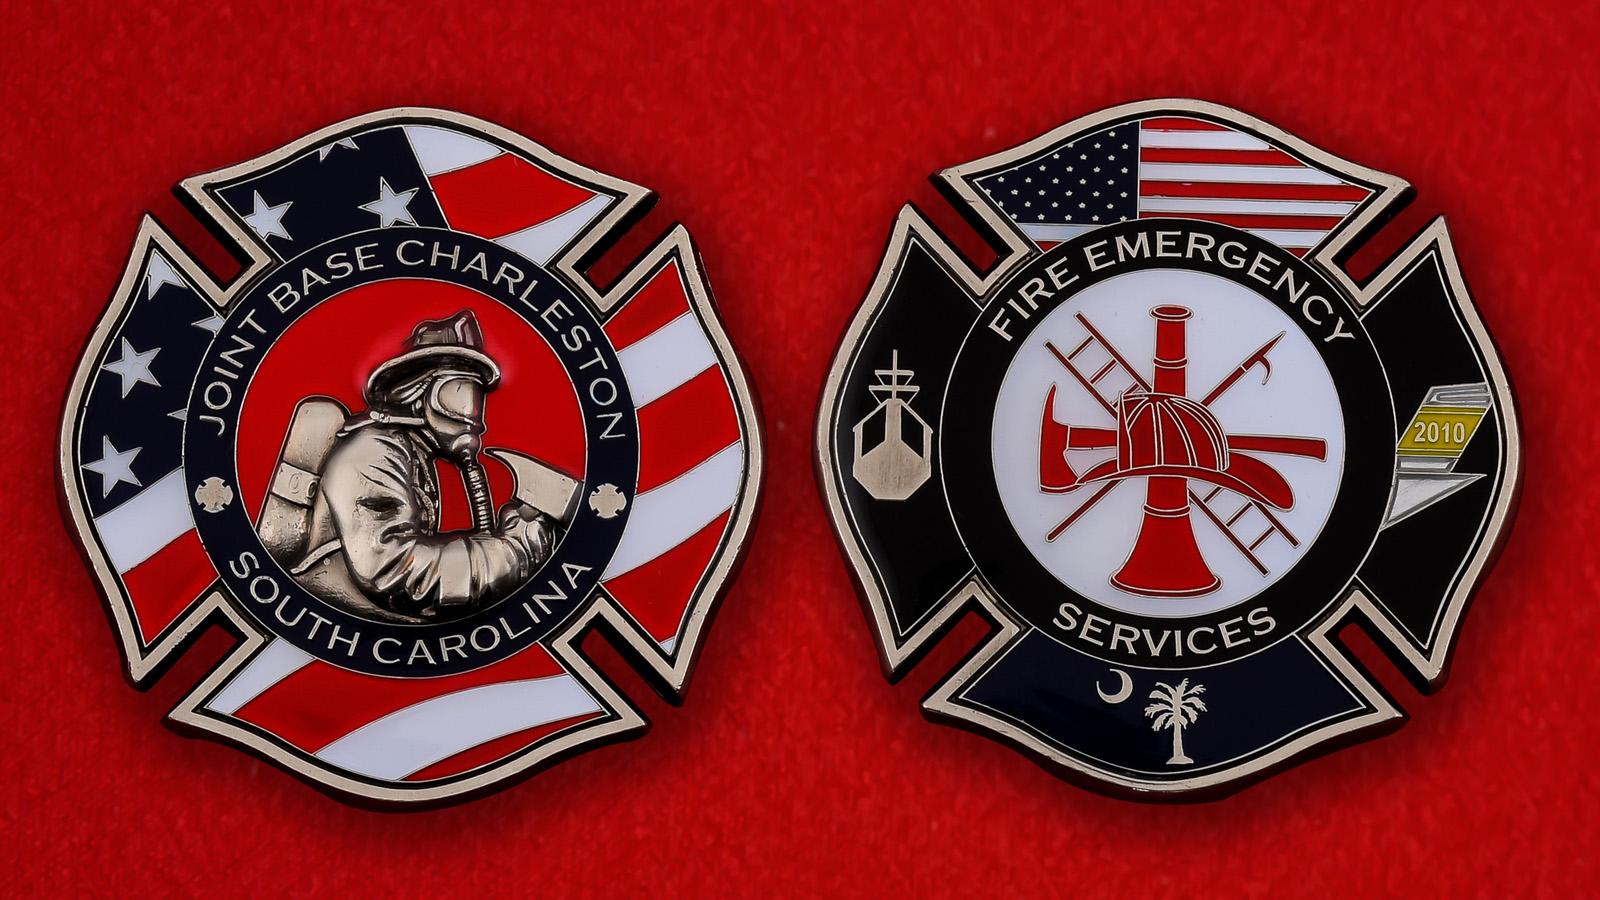 Челлендж коин Аварийной Пожарной службы Базы Чарльстон, Южная Каролина